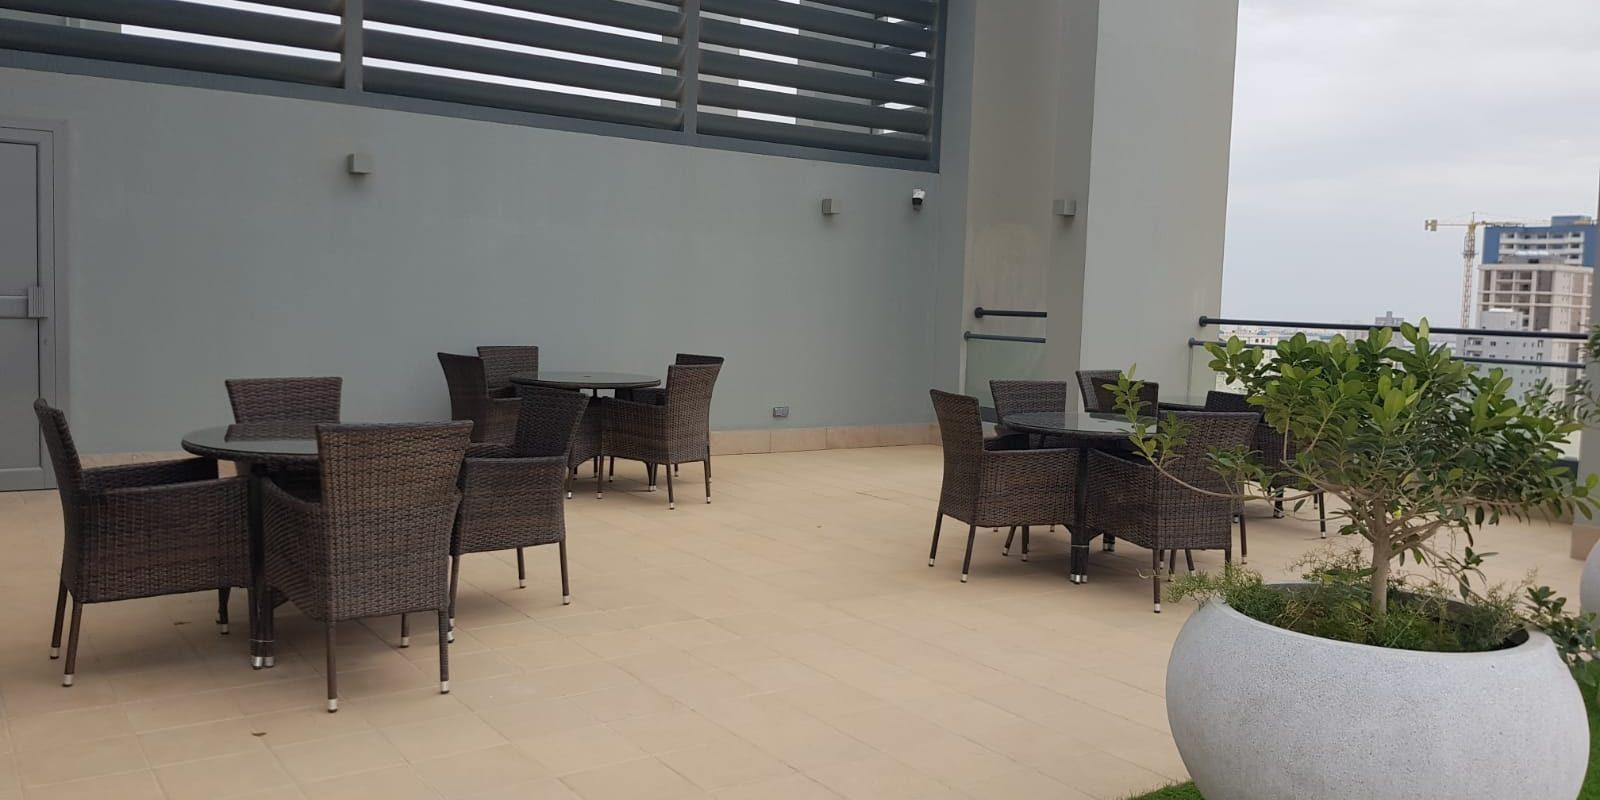 Impressive Brand New 2 BR Apartment in Juffair!